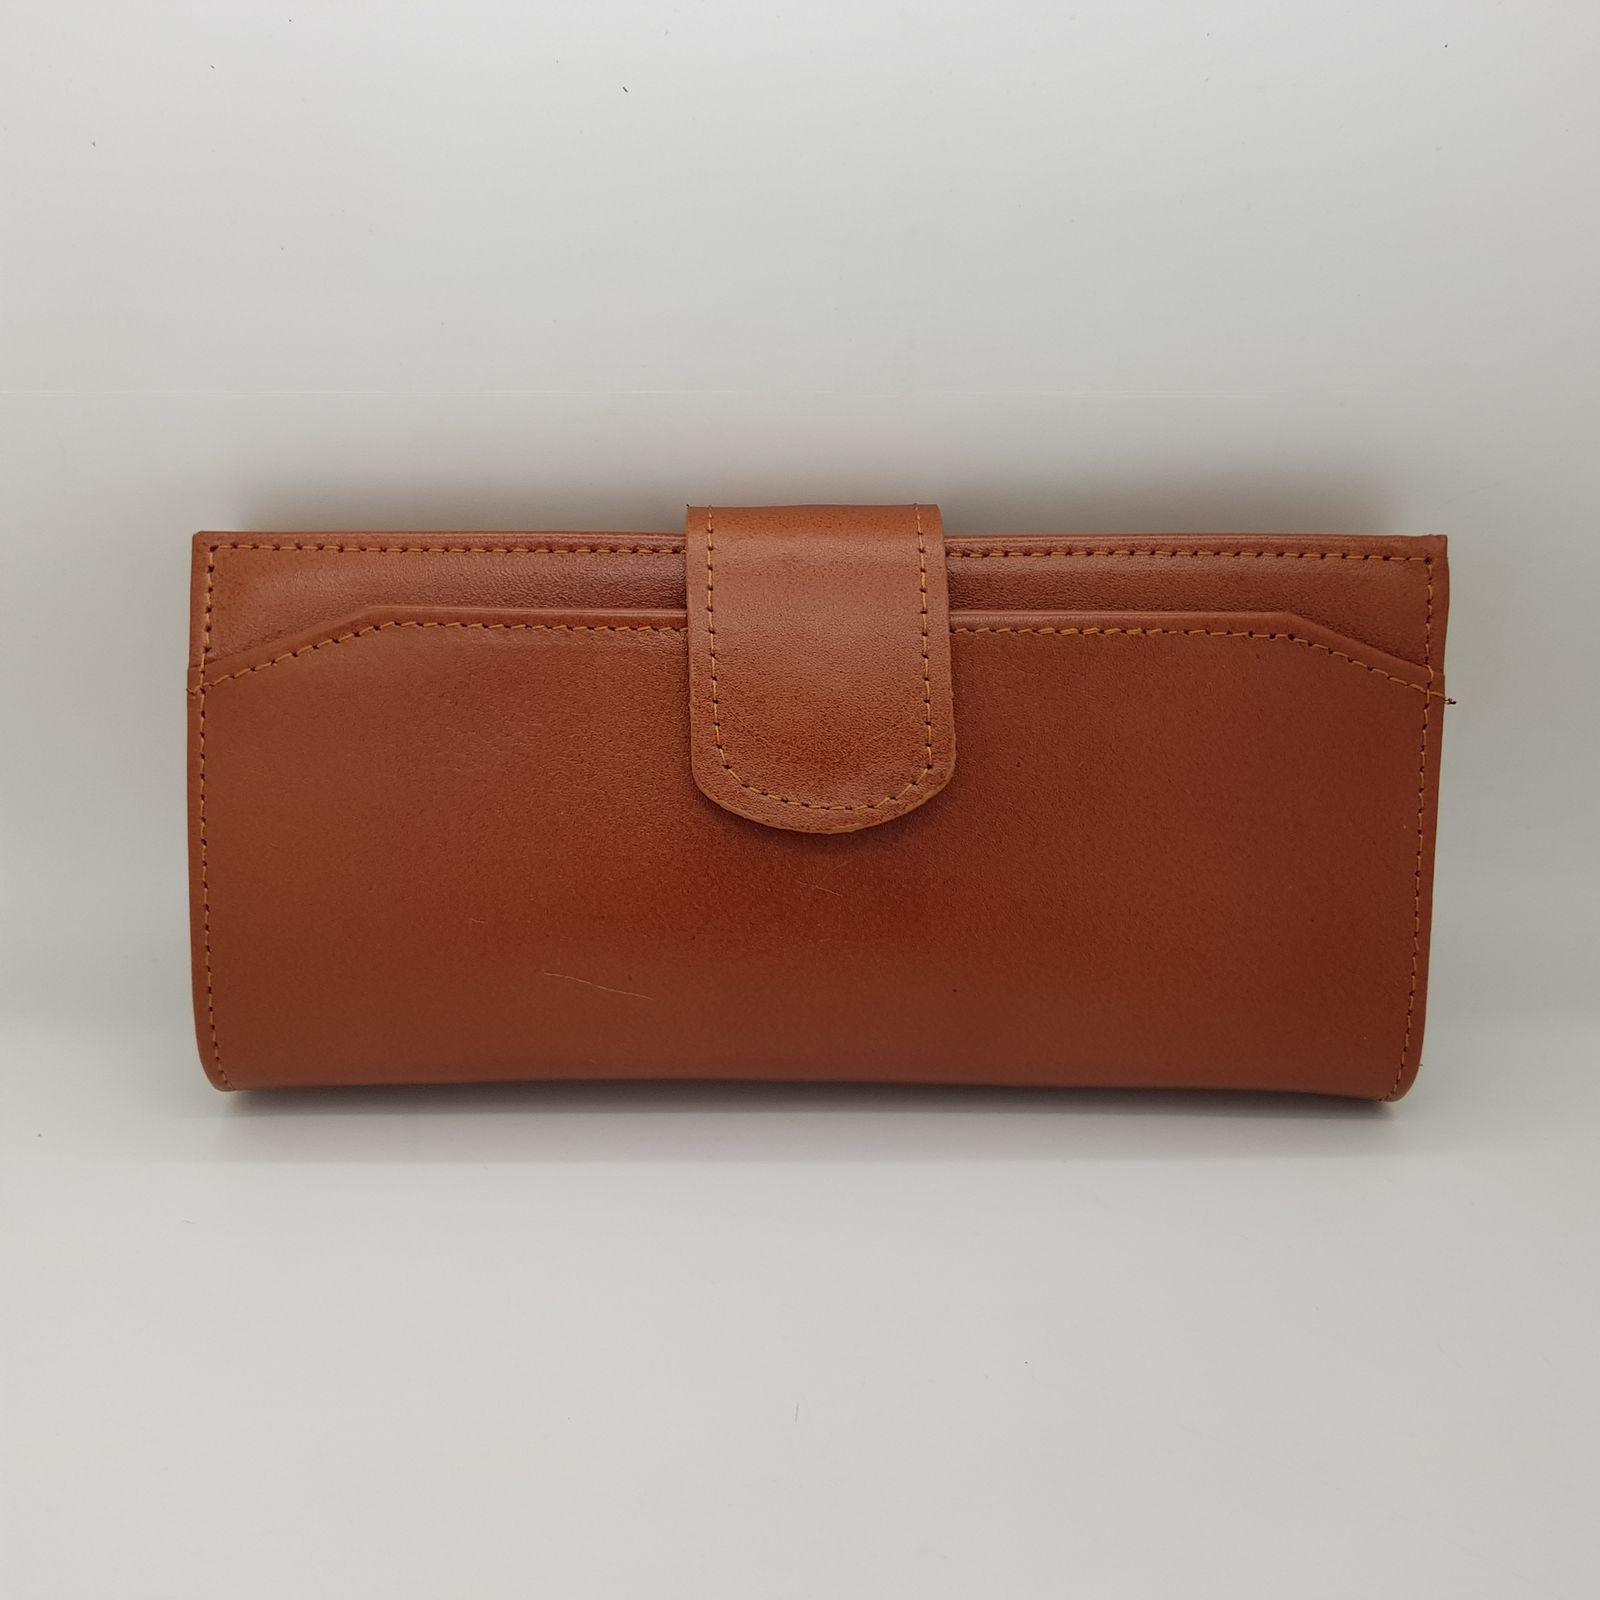 کیف پول زنانه چرم دیاکو مدل 315 -  - 6